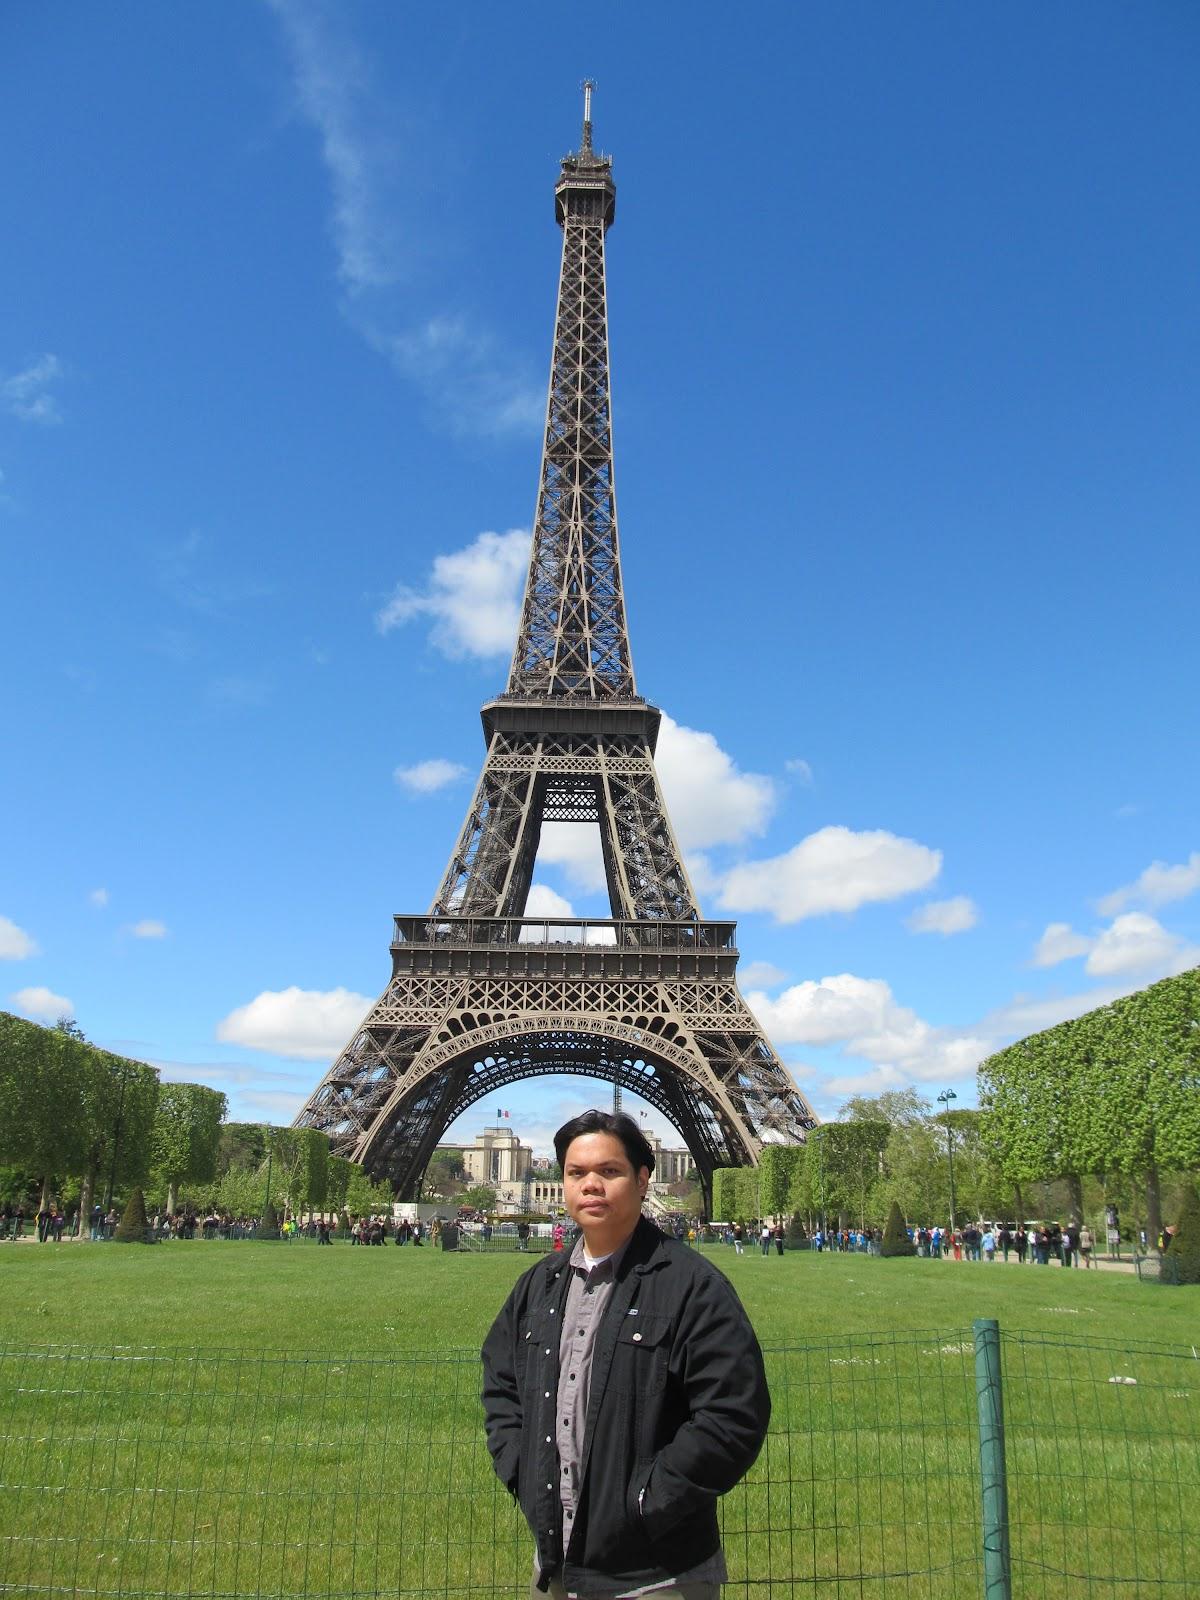 Paris France Eiffel Tower from Champ de Mars